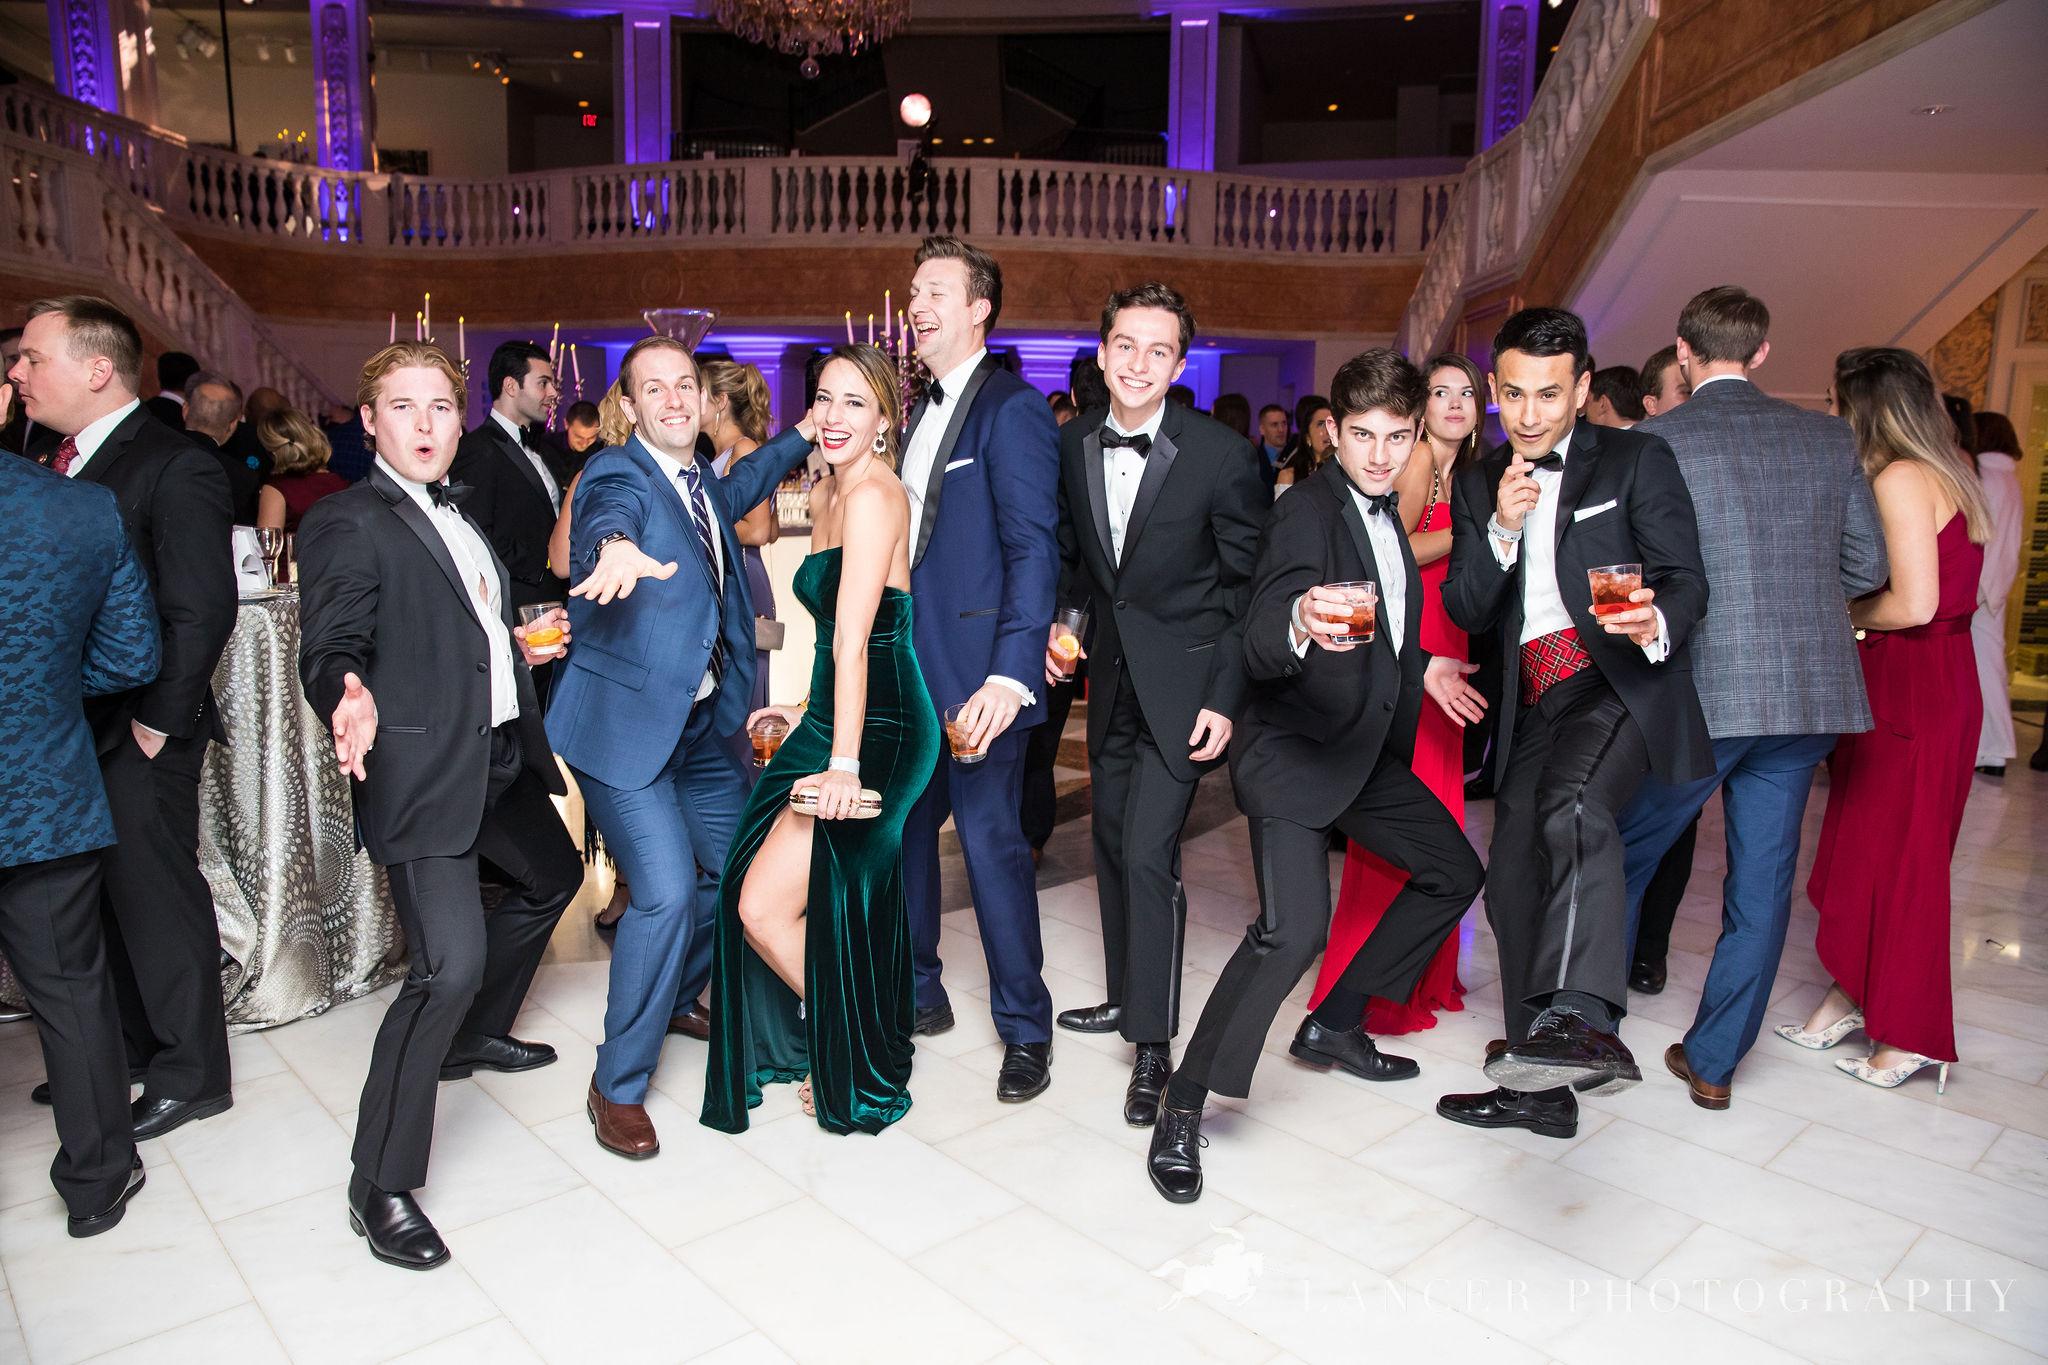 2018-12-05_AmericanFreedomFund's5thAnnualManhattans,Martinis,&MistletoeSoiree-2246